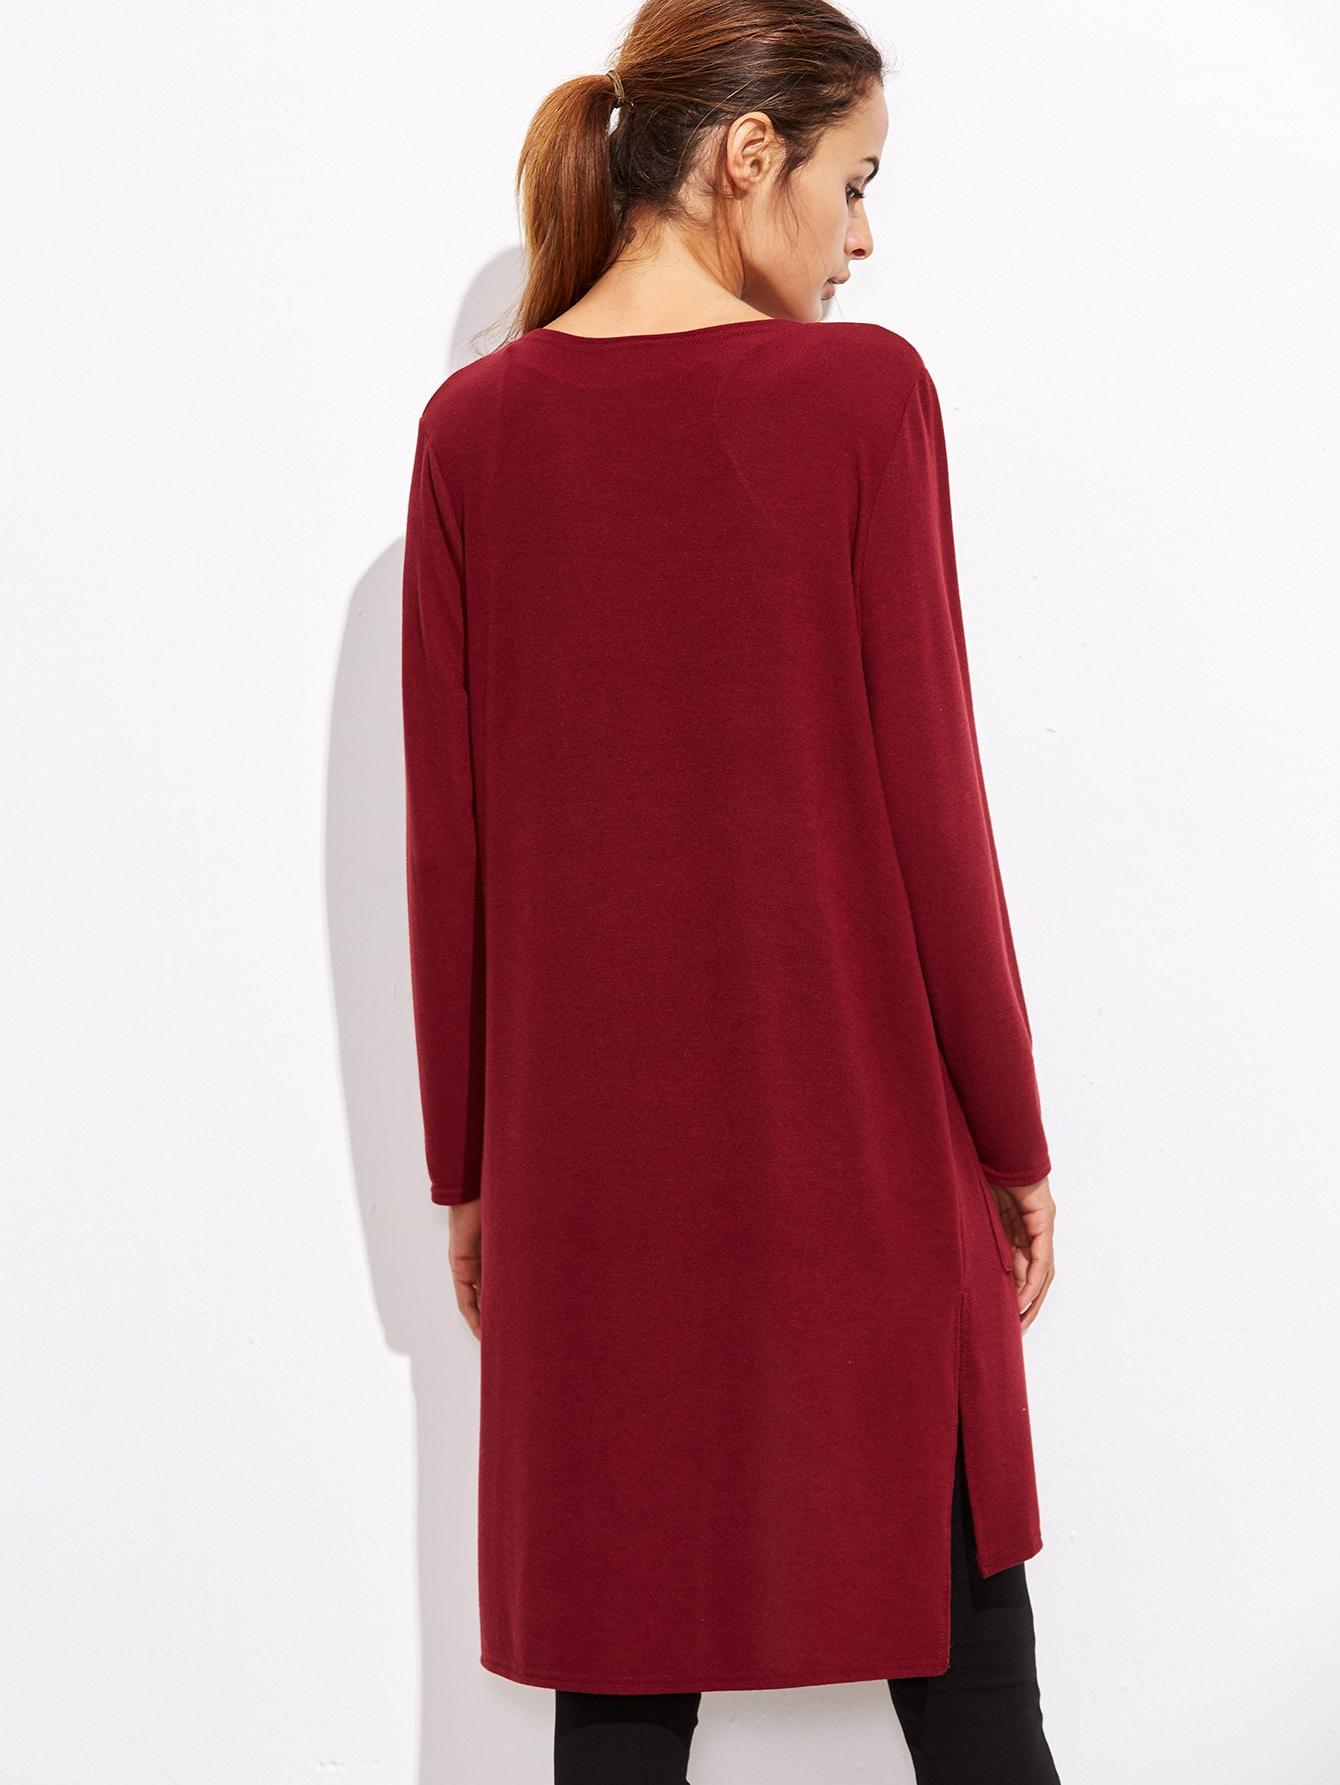 sweater161019132_2